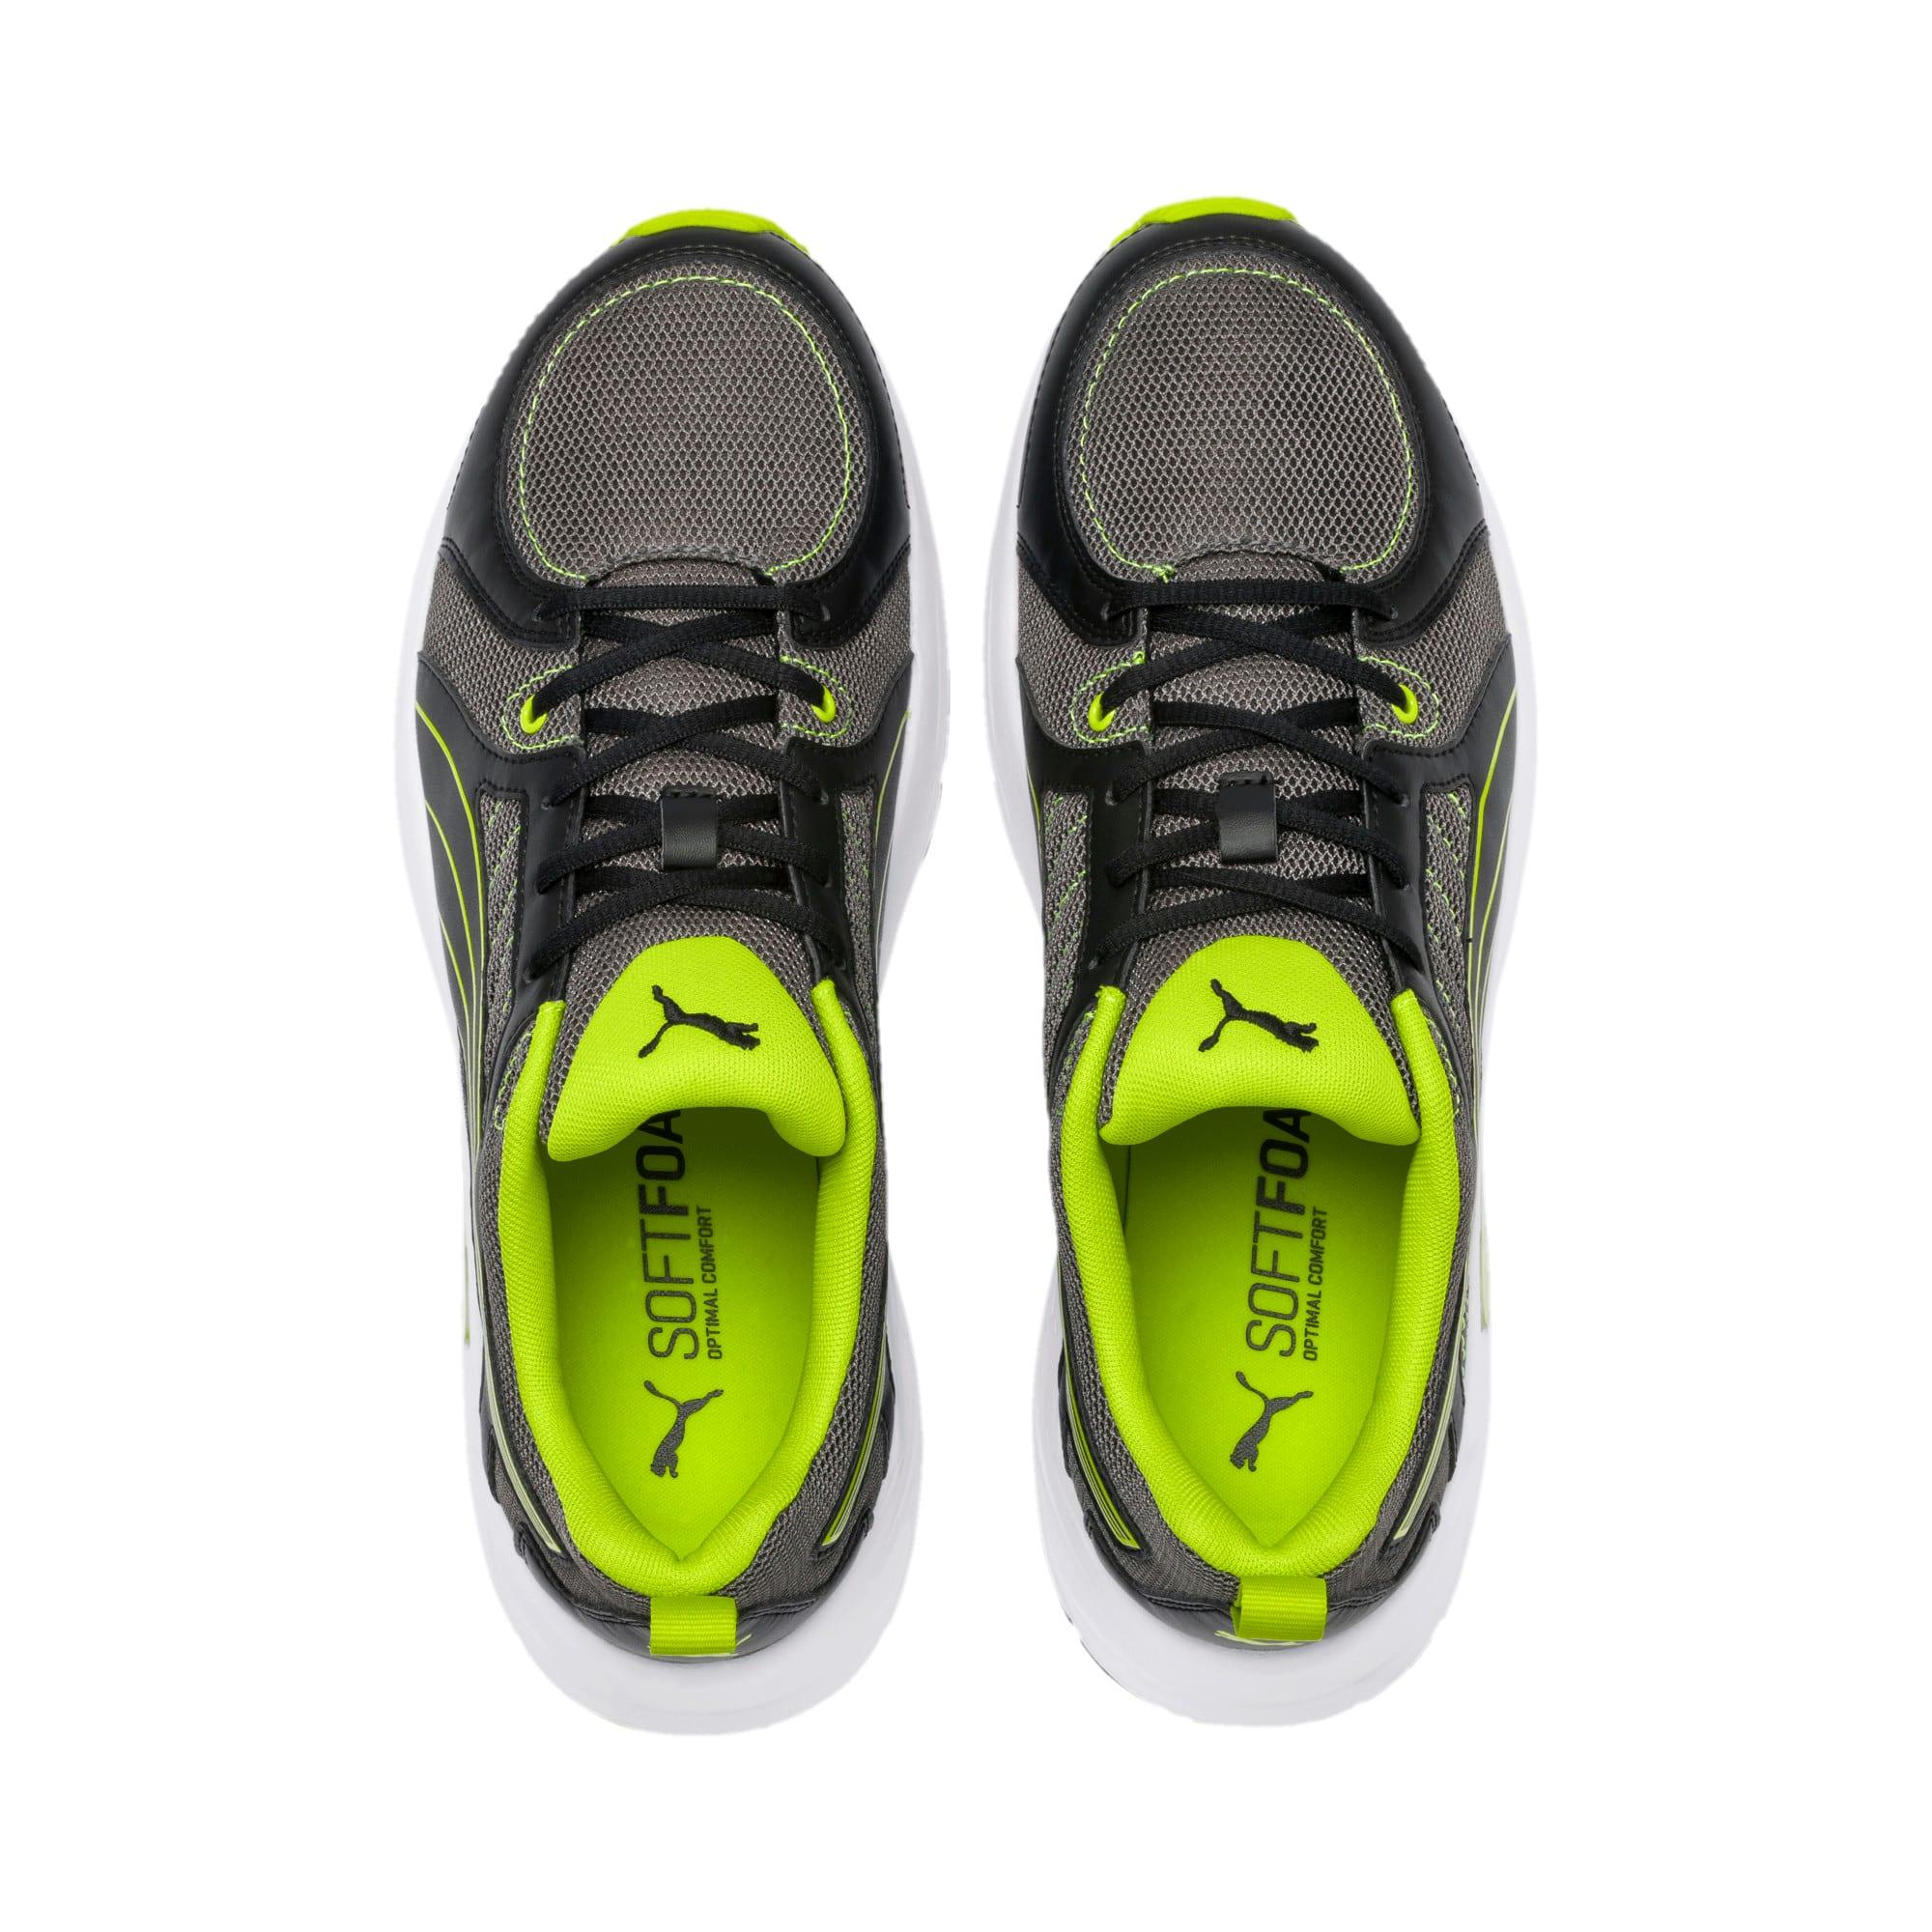 Thumbnail 7 of Nucleus Run Training Shoes, CASTLEROCK-Limepunch, medium